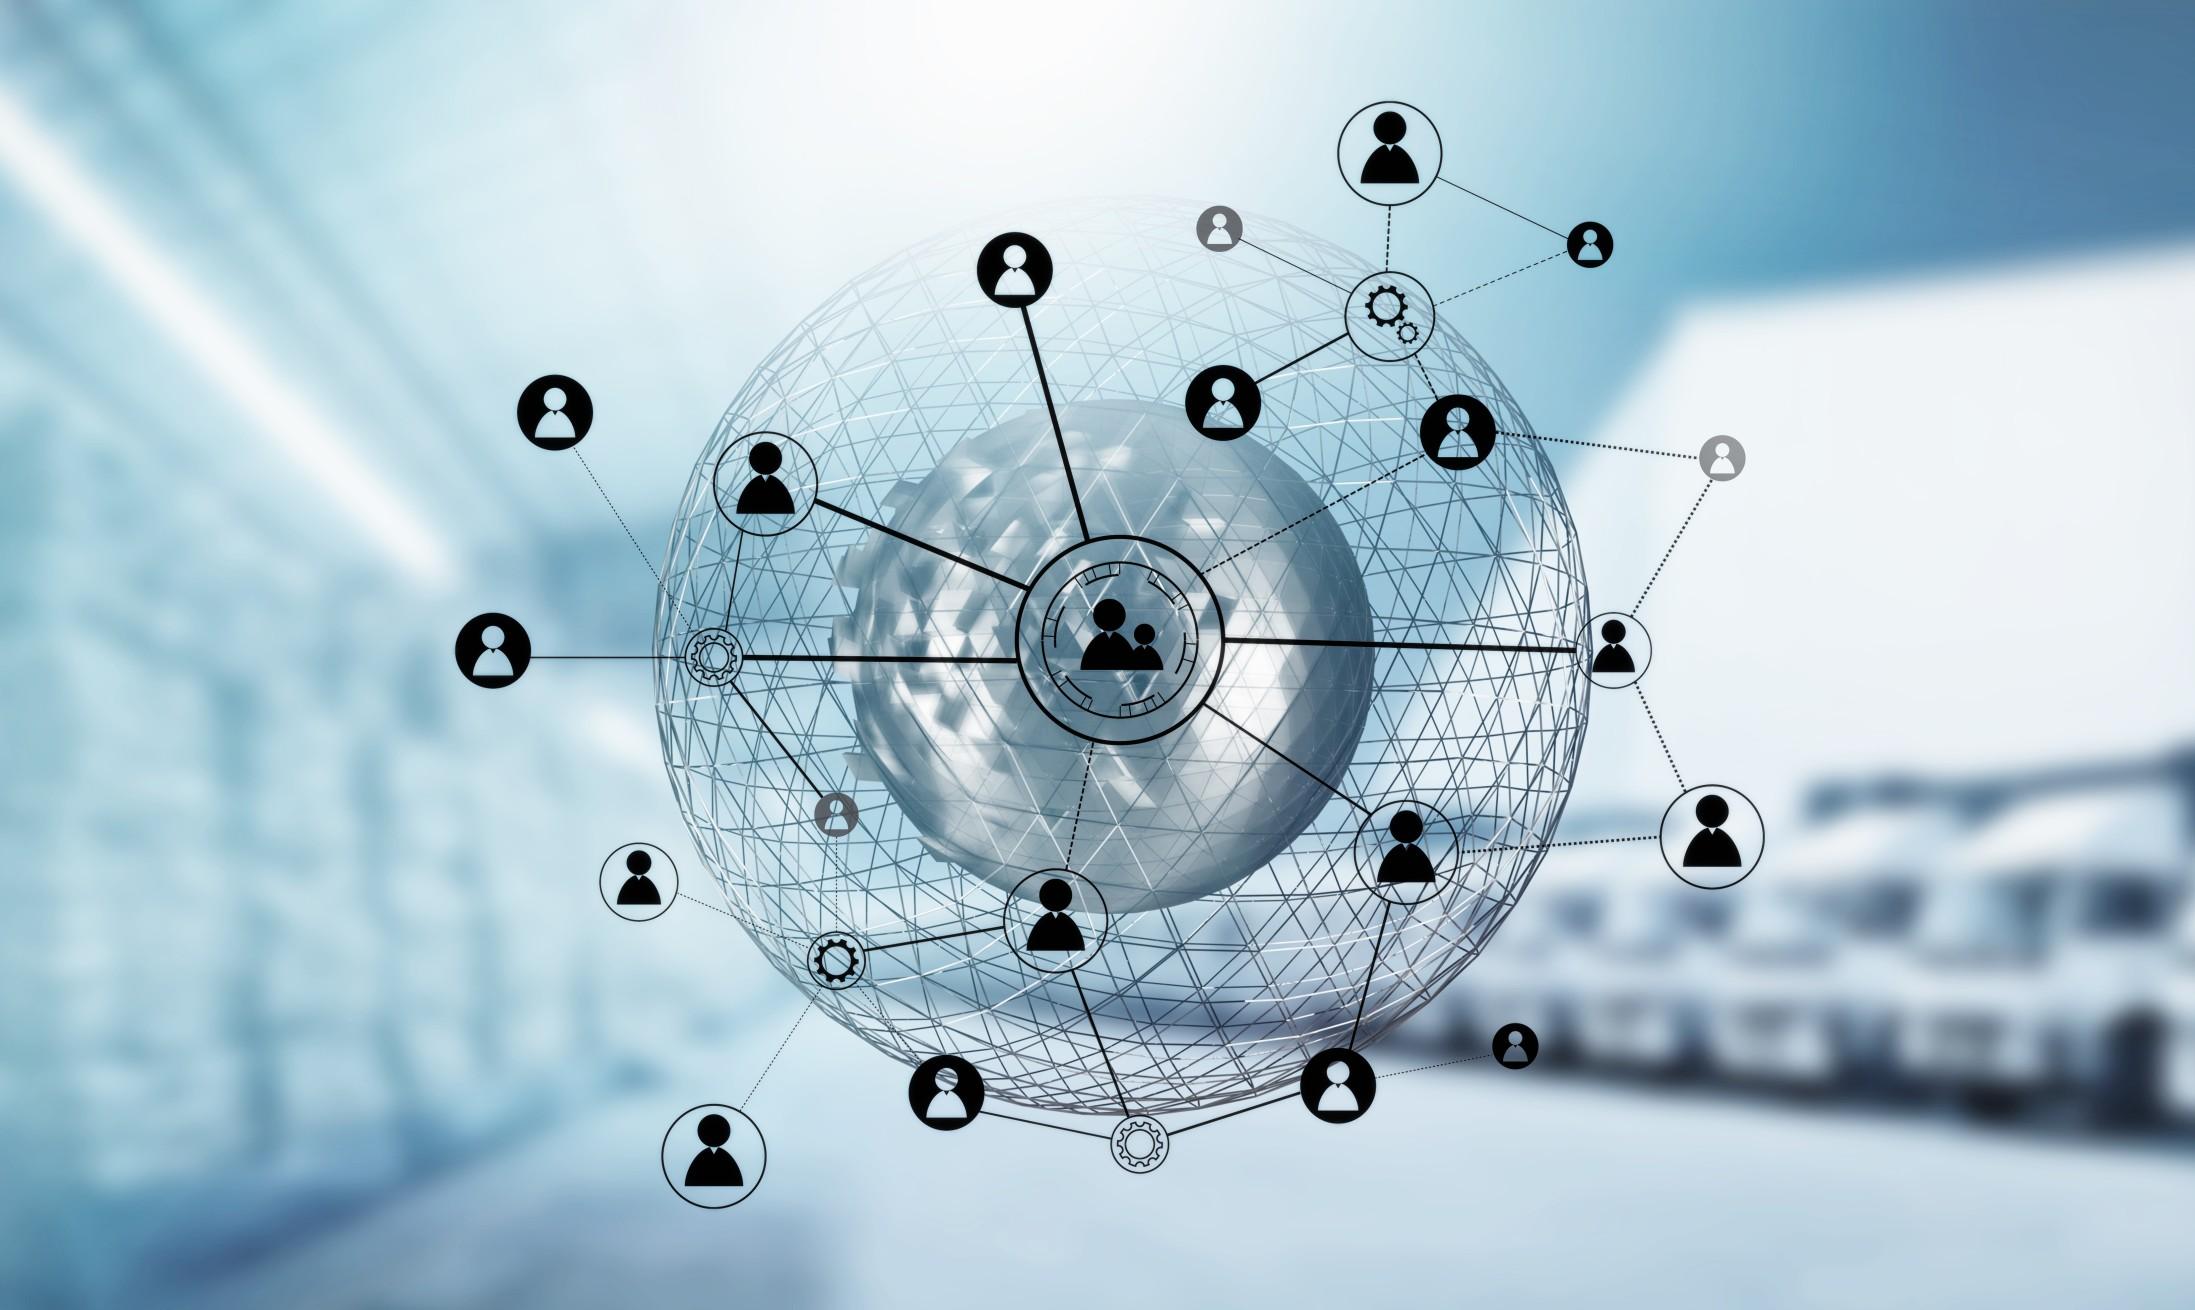 business-connection-chain-social-network-team-group-teamwork-people-community-communication-internet-t20-kRRxp2.jpg